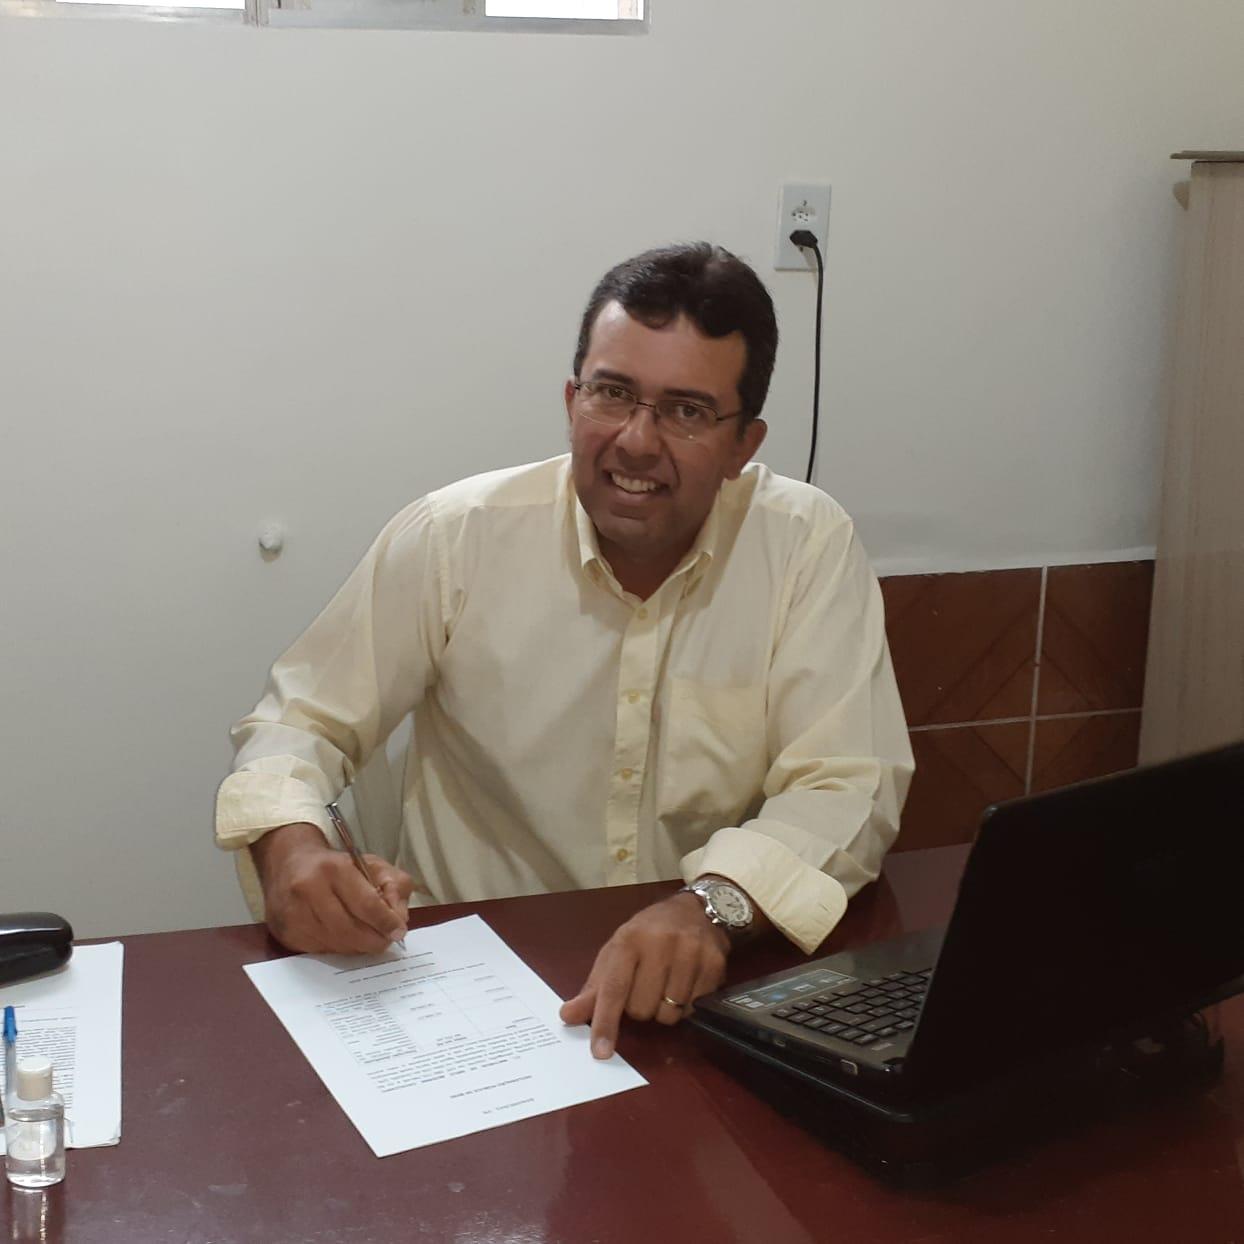 Foto Perfil Maganez Vieira dos Santos